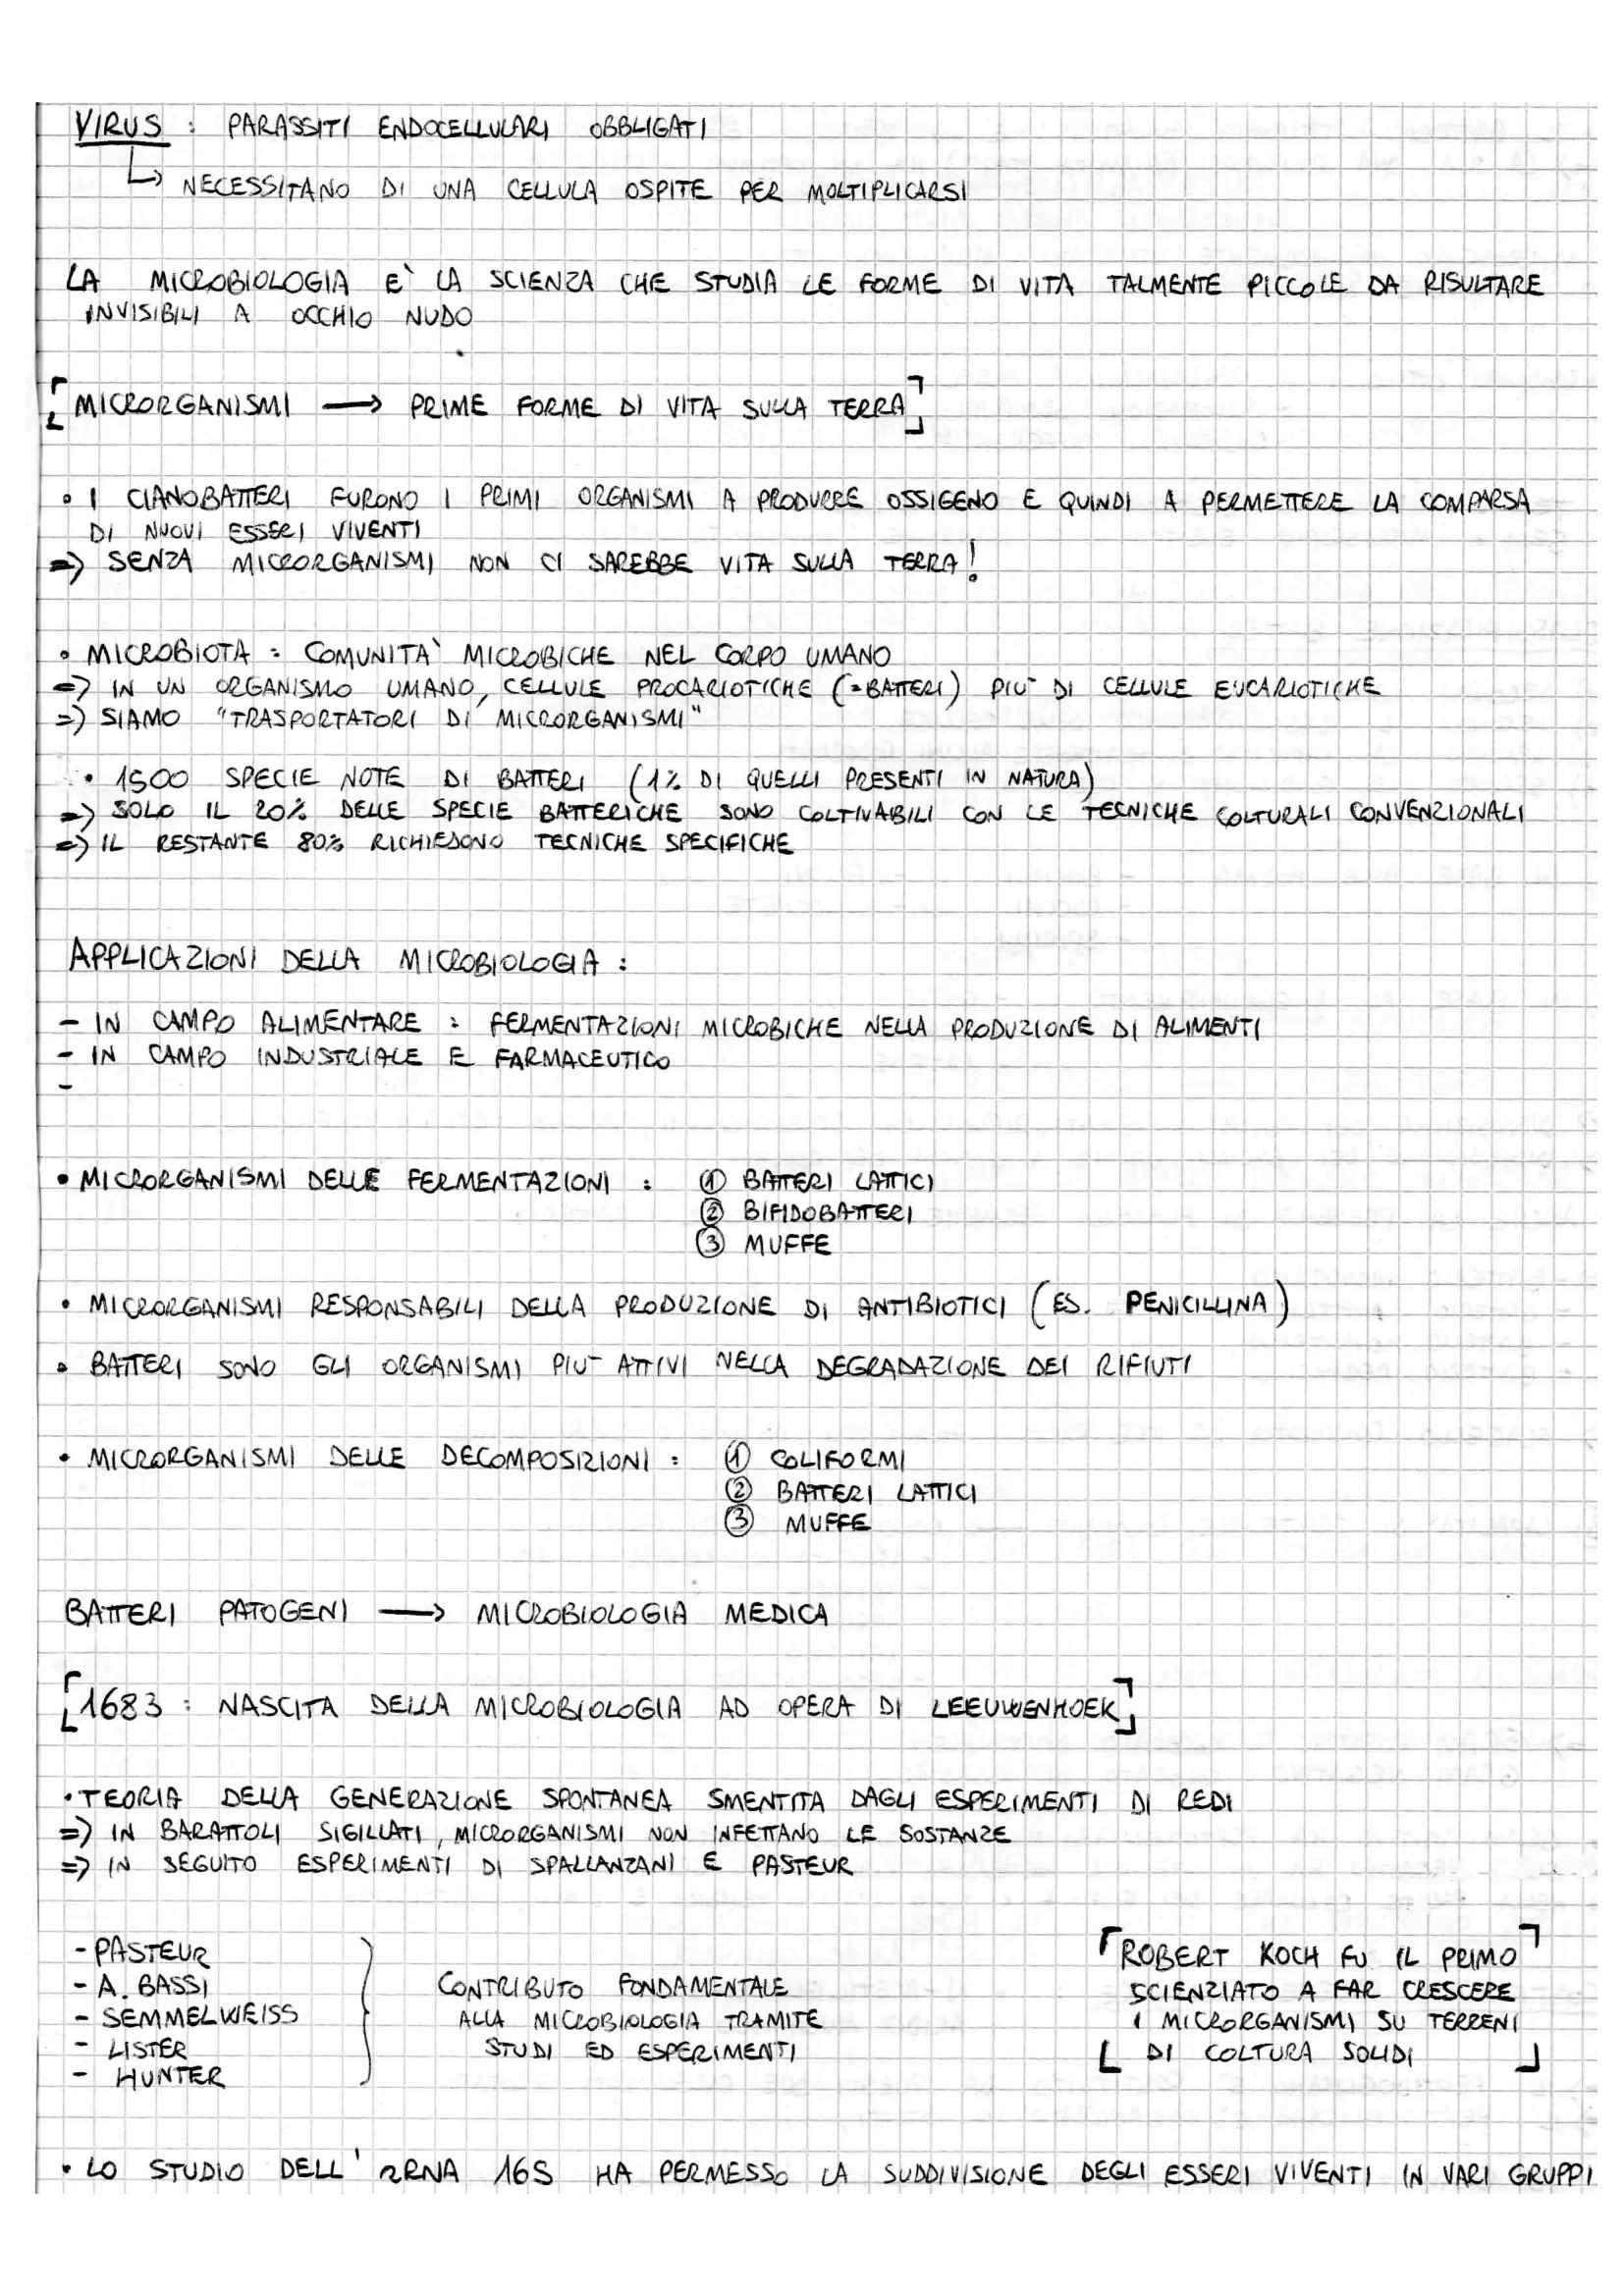 Microbiologia generale - Appunti